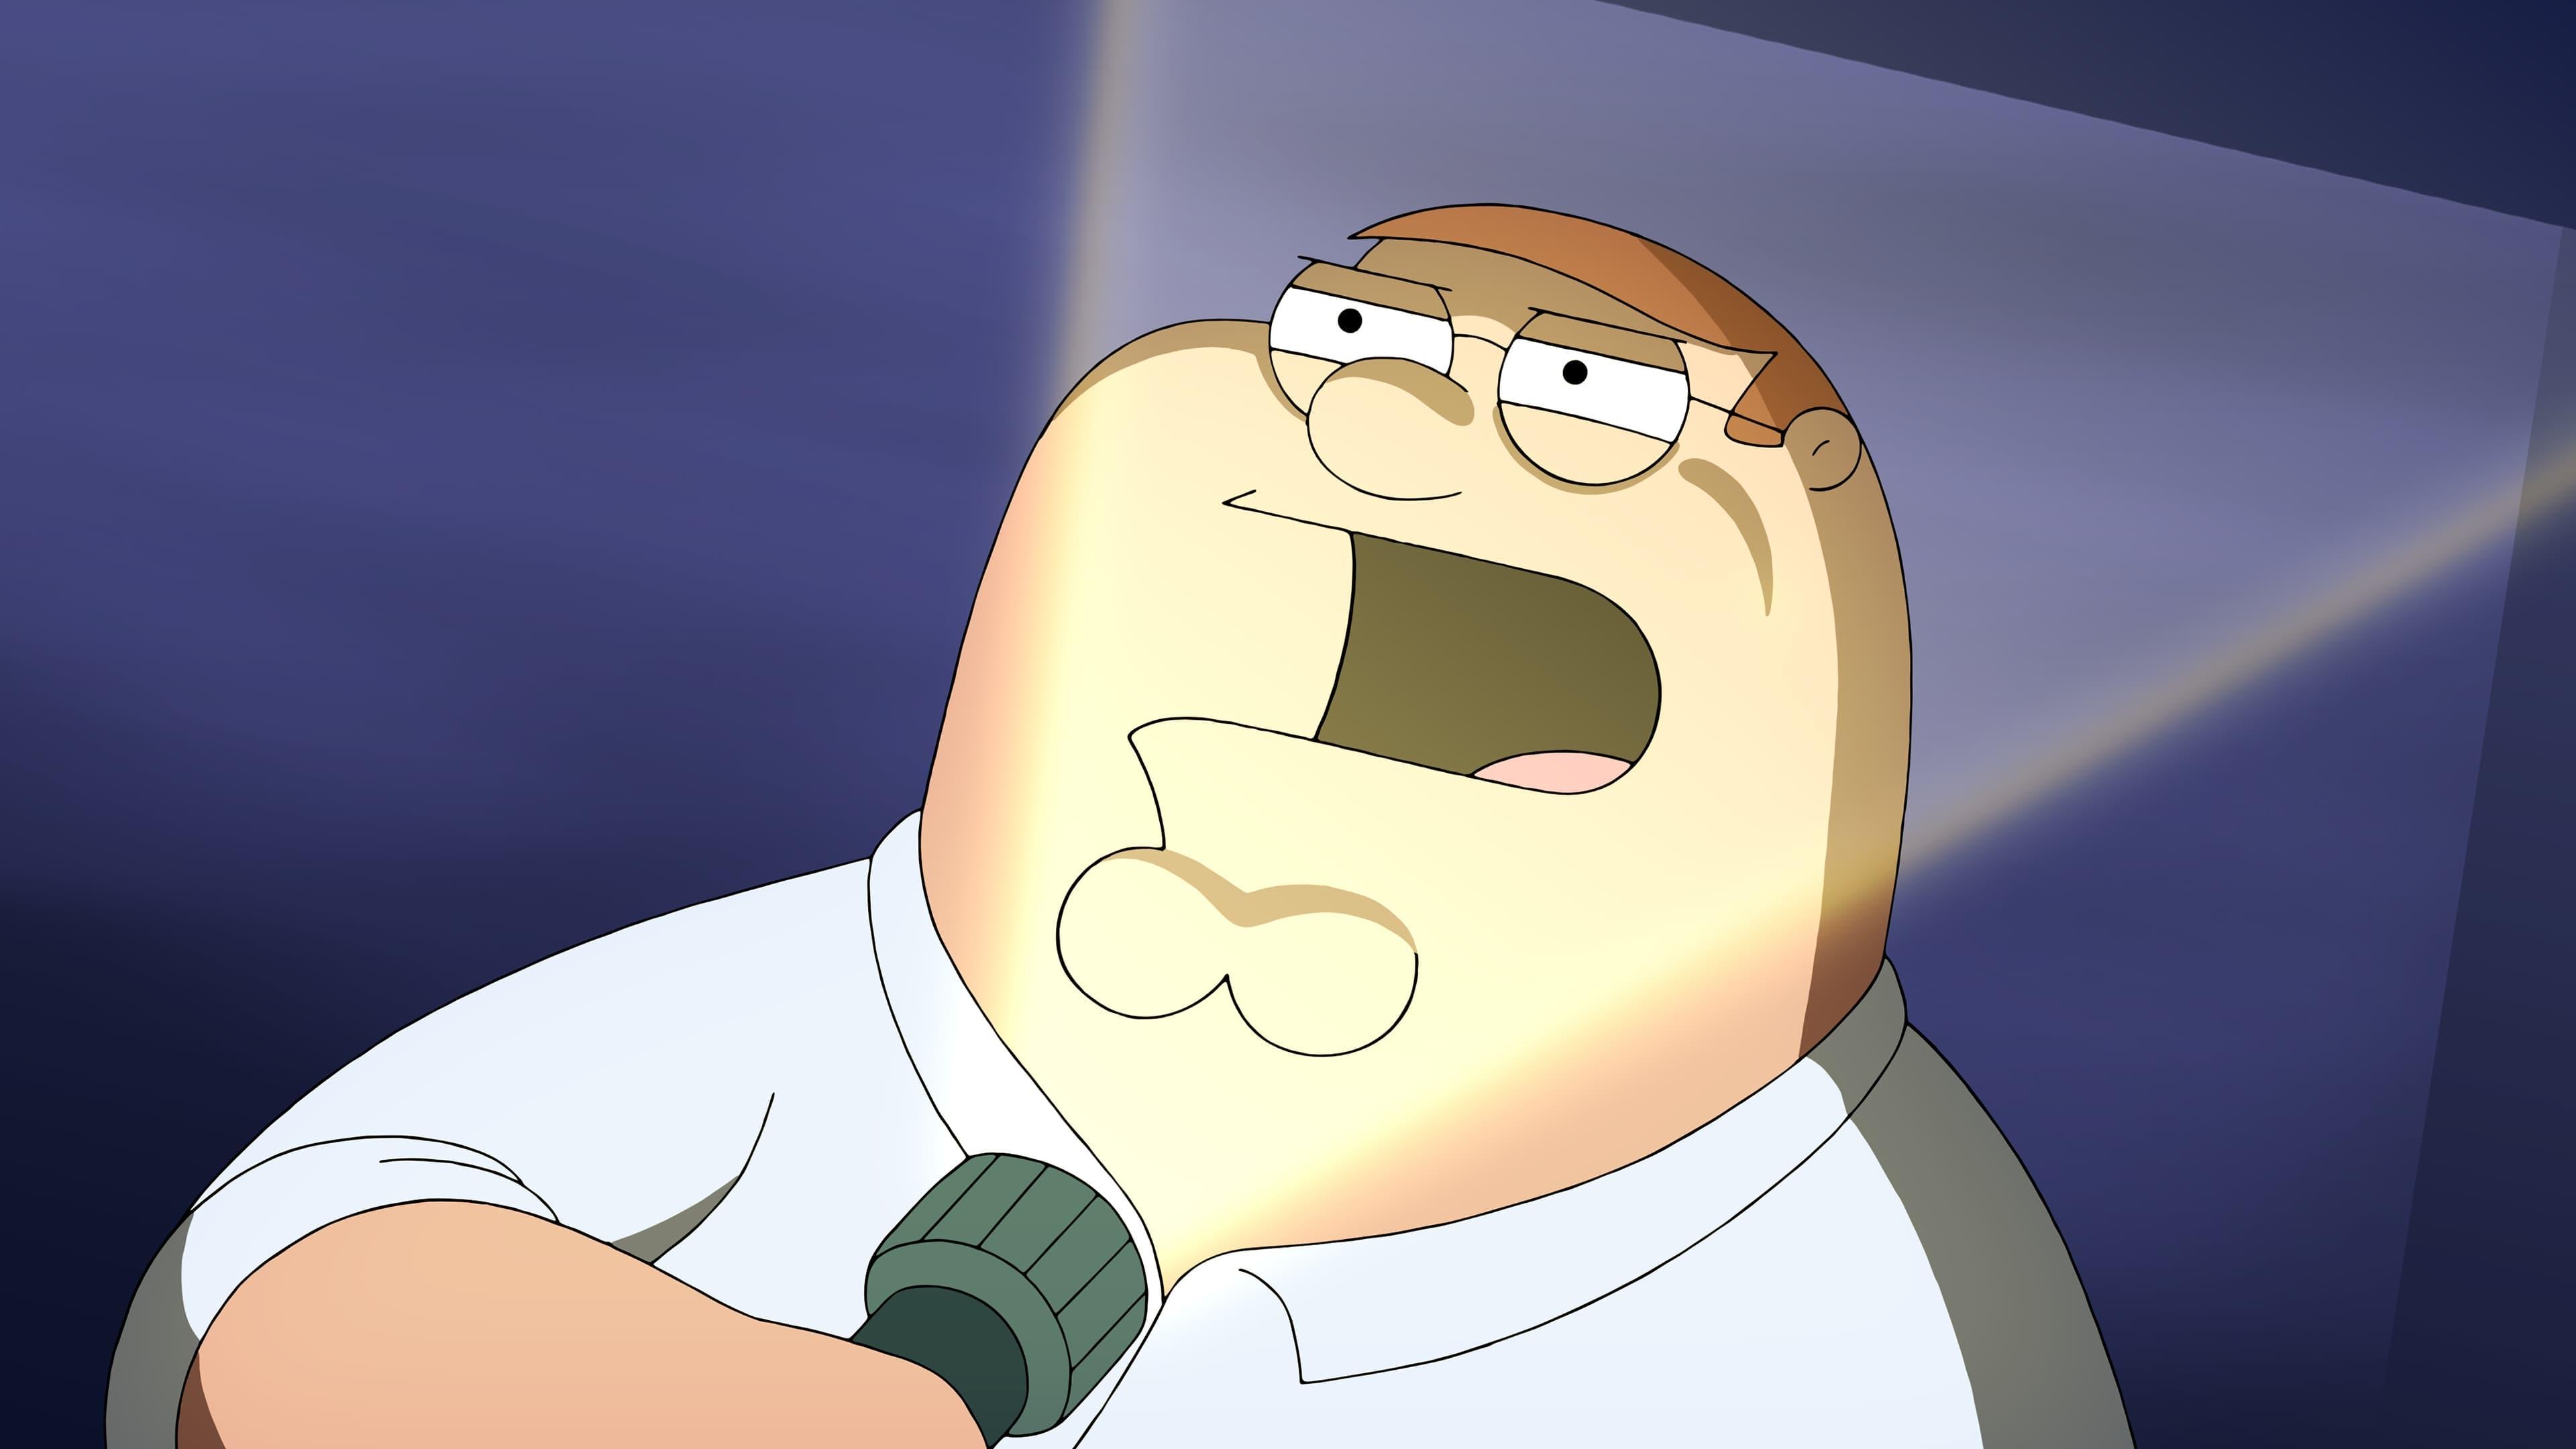 Family Guy: Temporada 14, Capitulo 4